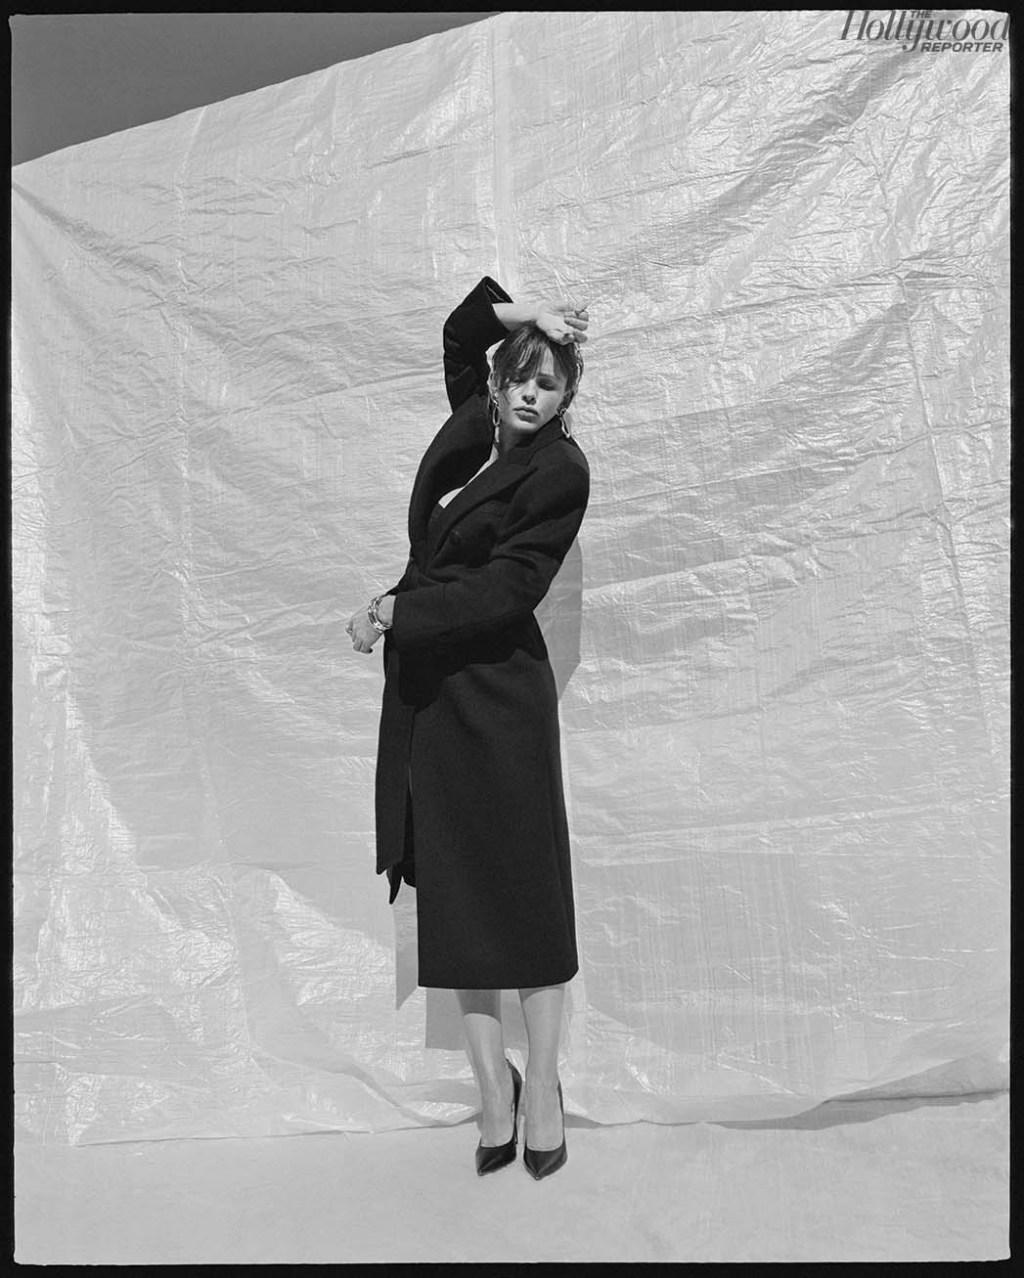 Jennifer Garner Photographed by Mary Rozzi